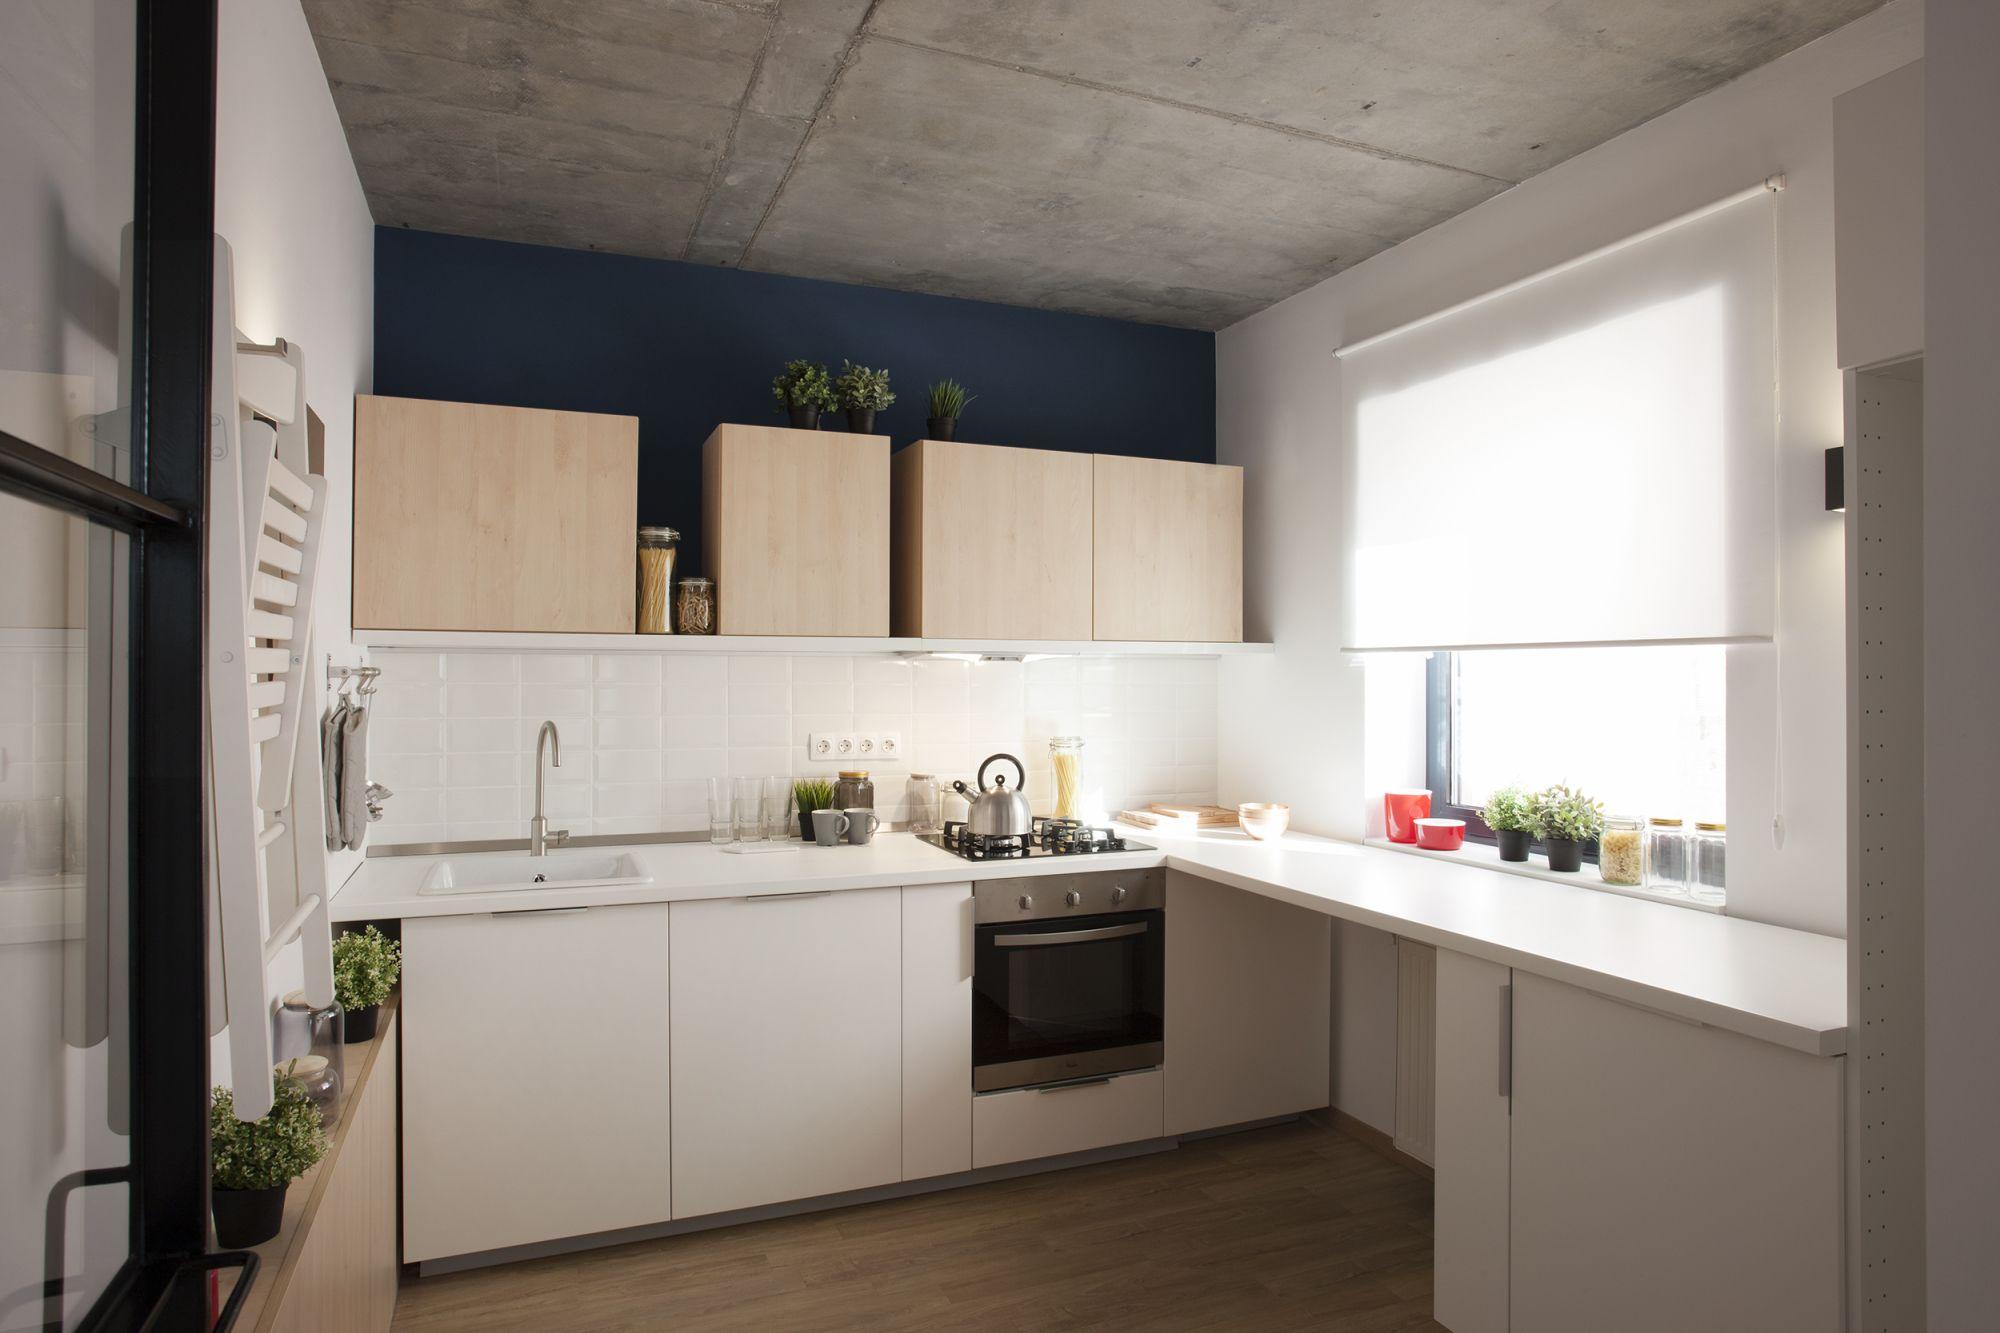 Apartment no roşu ciocodeică kitchen dining pinterest